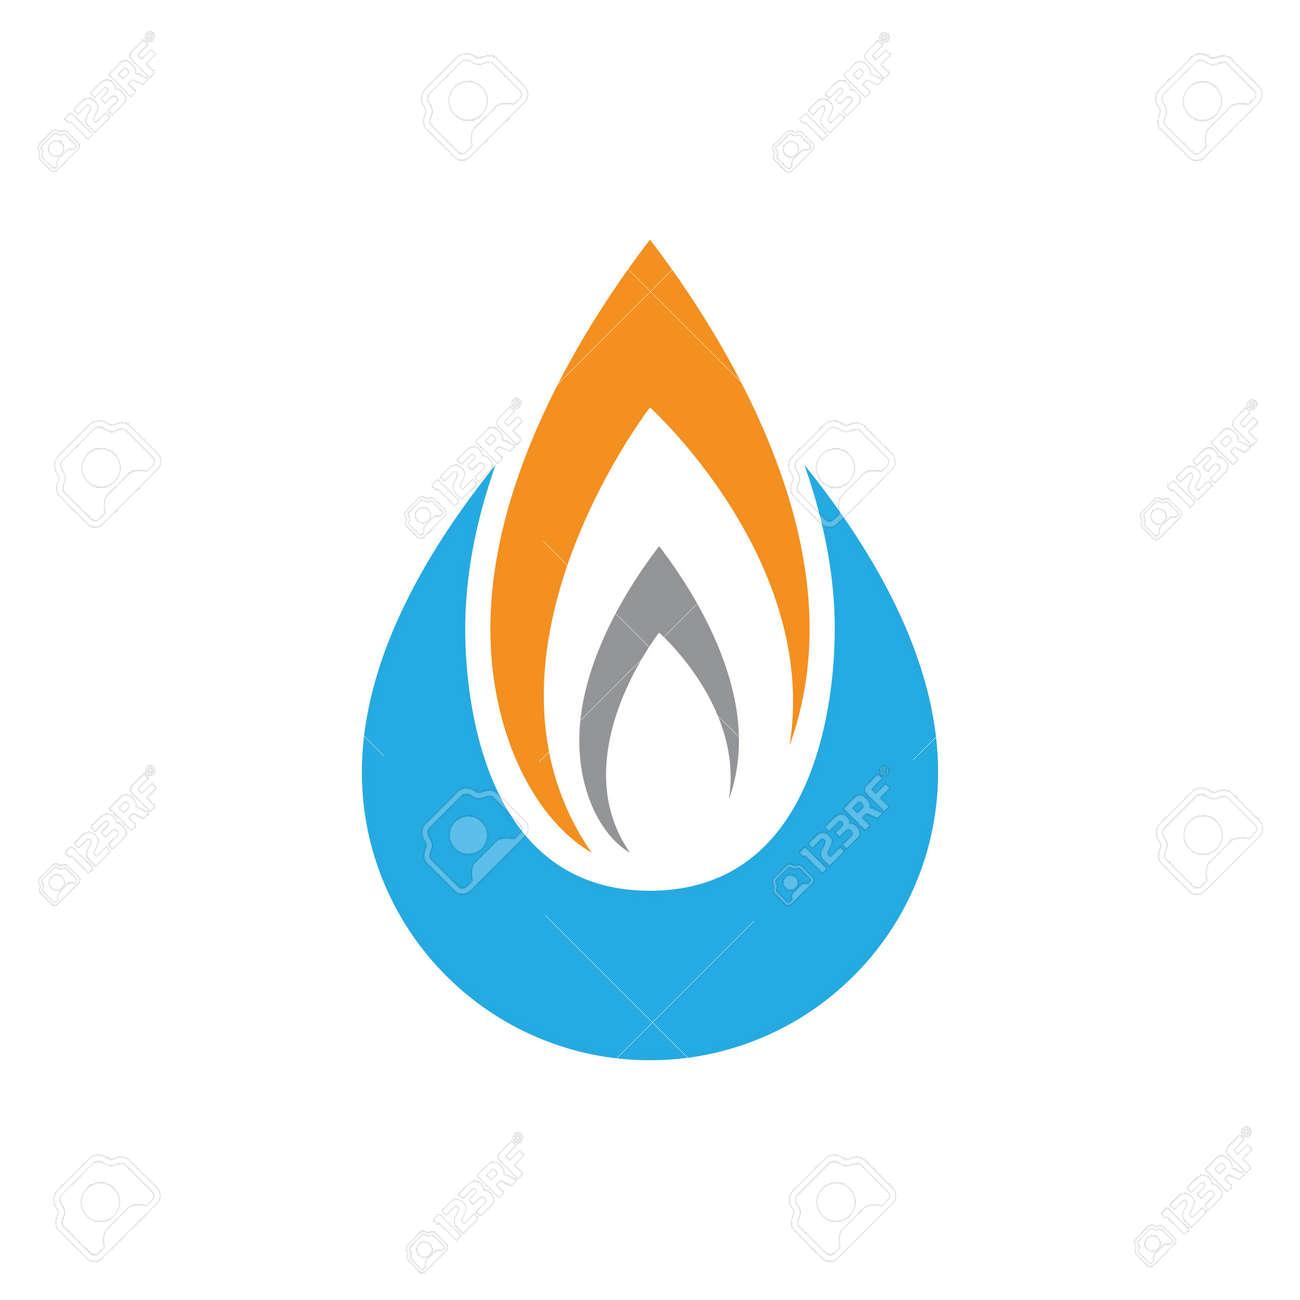 Oil and gas logo images illustration design - 172261493